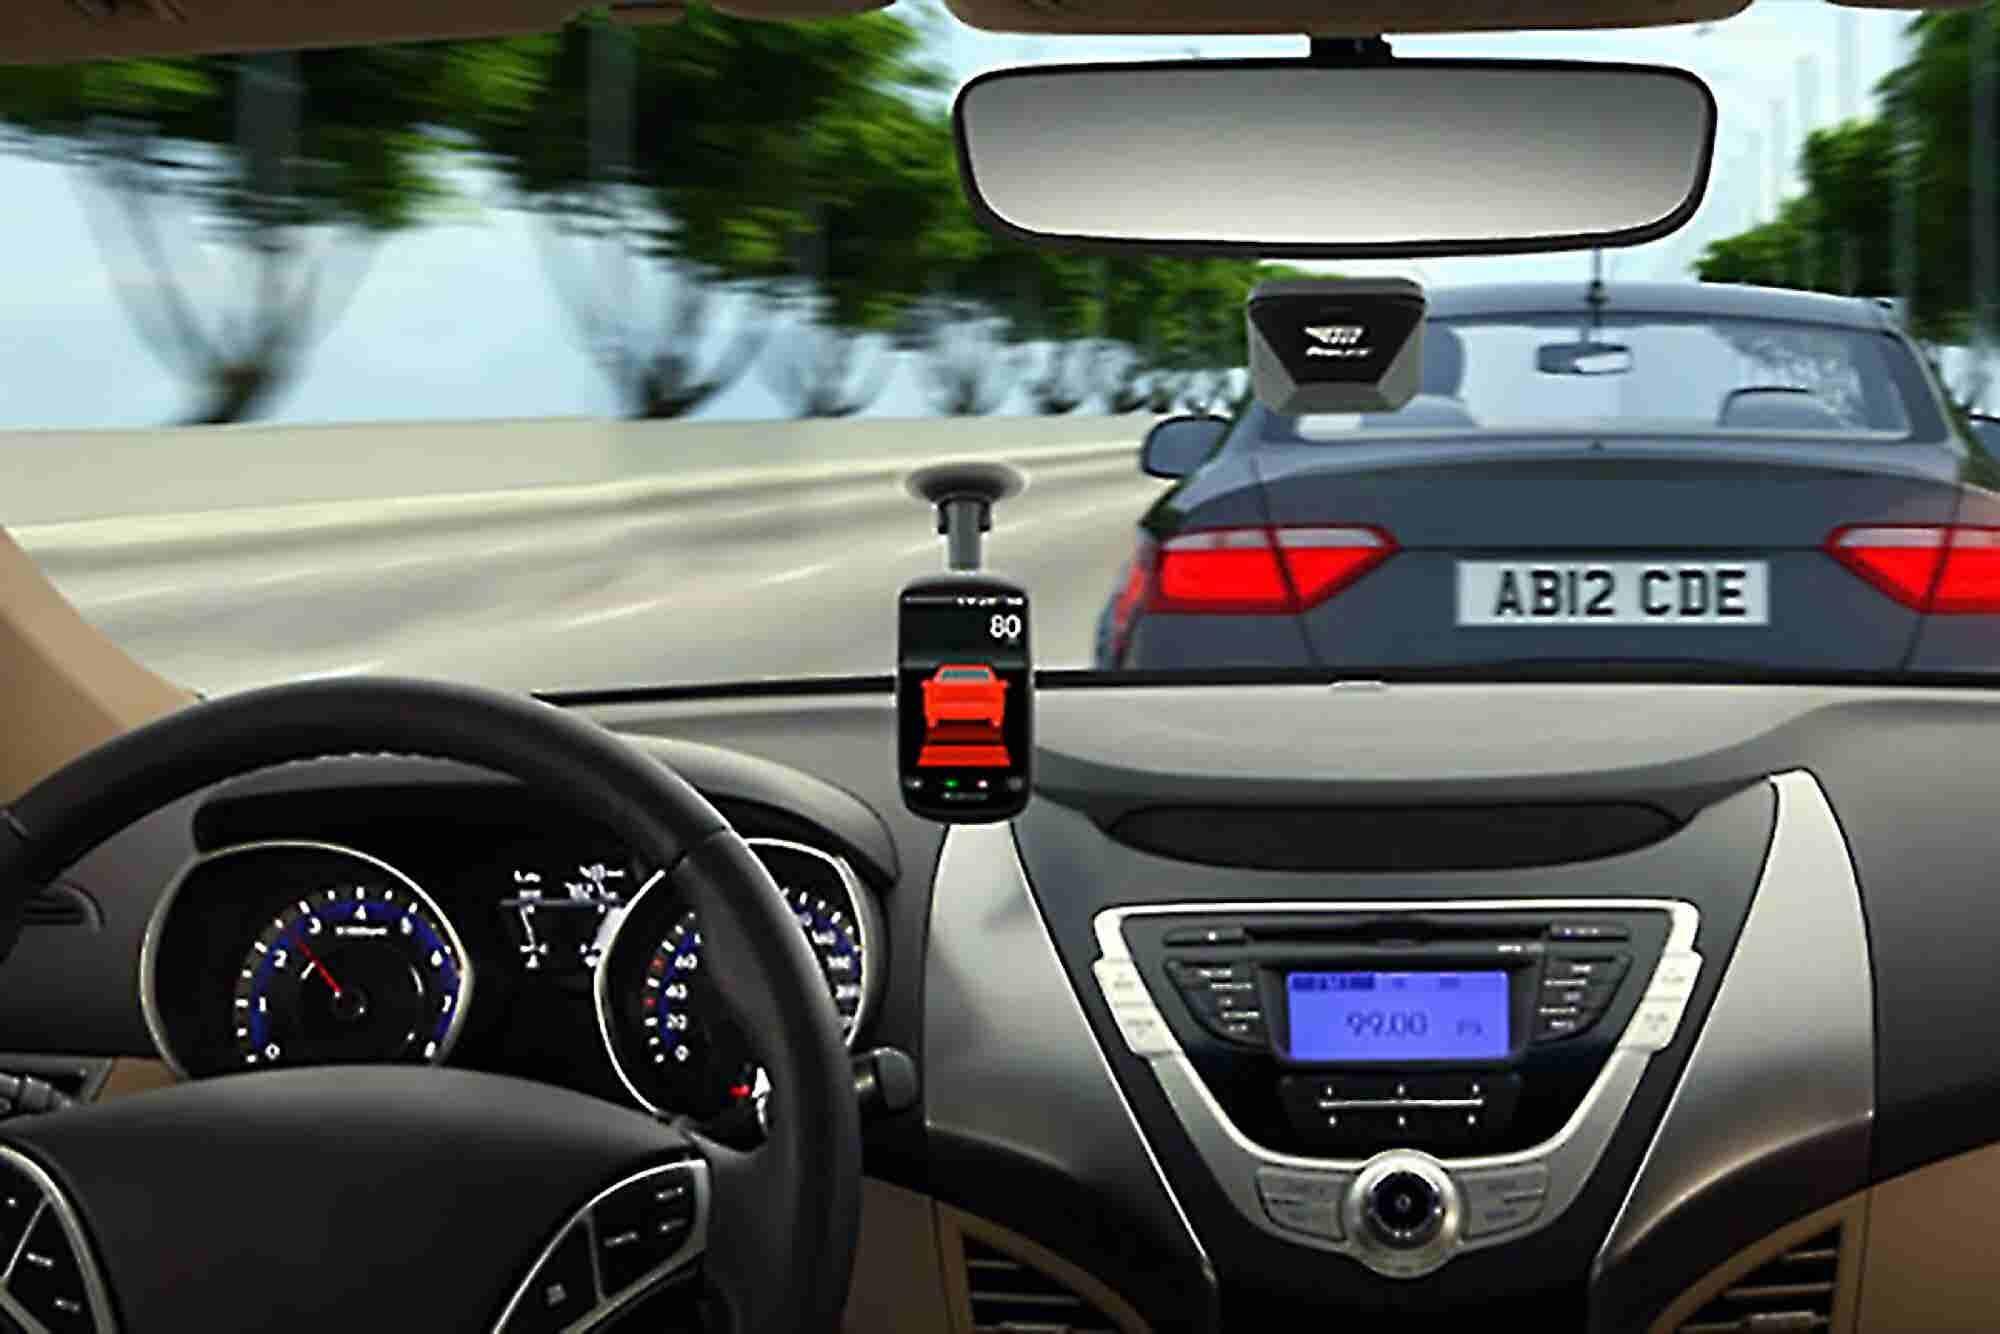 Mobileye Valued at $1.5 Billion, Highlights Self-Driving Car Market